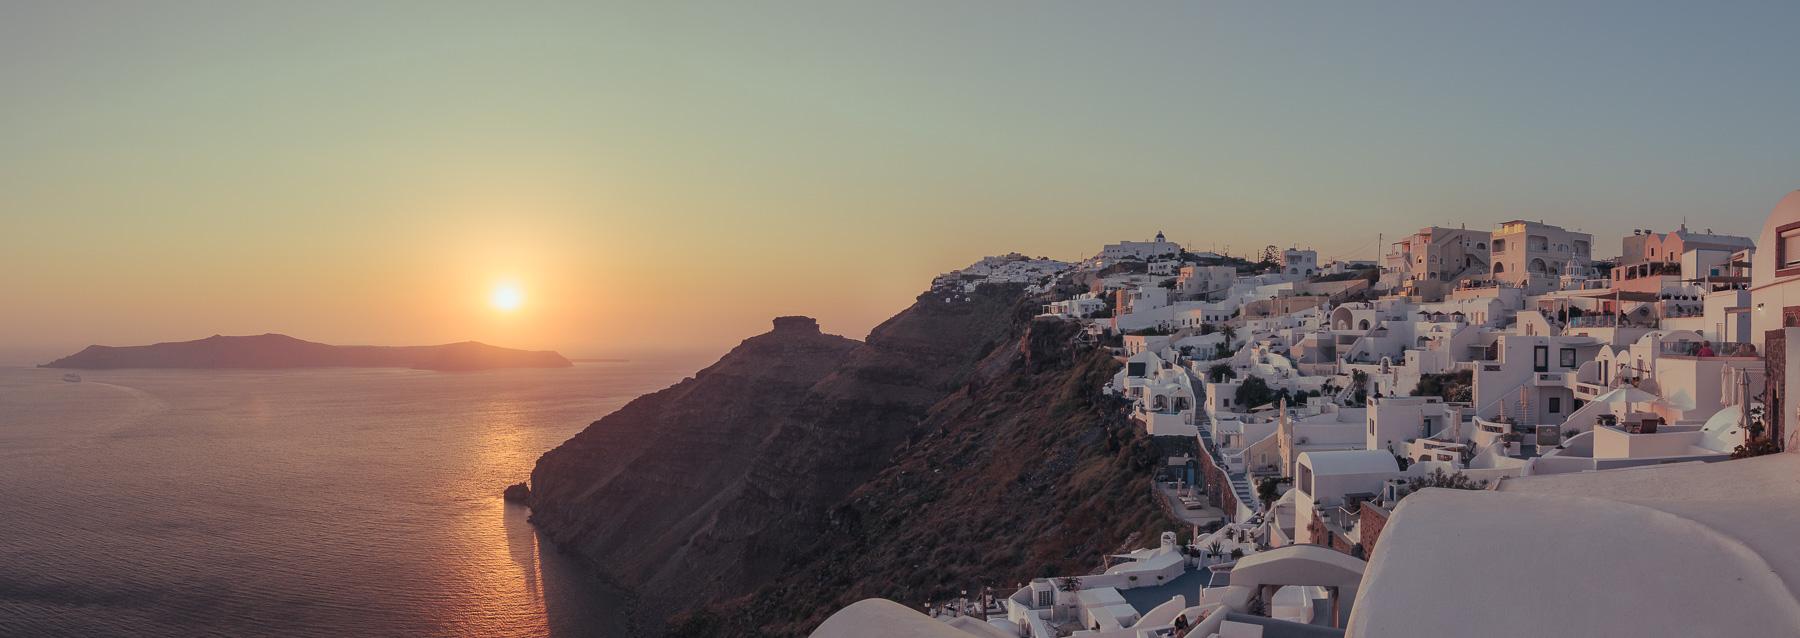 _MG_8483-Panorama.jpg